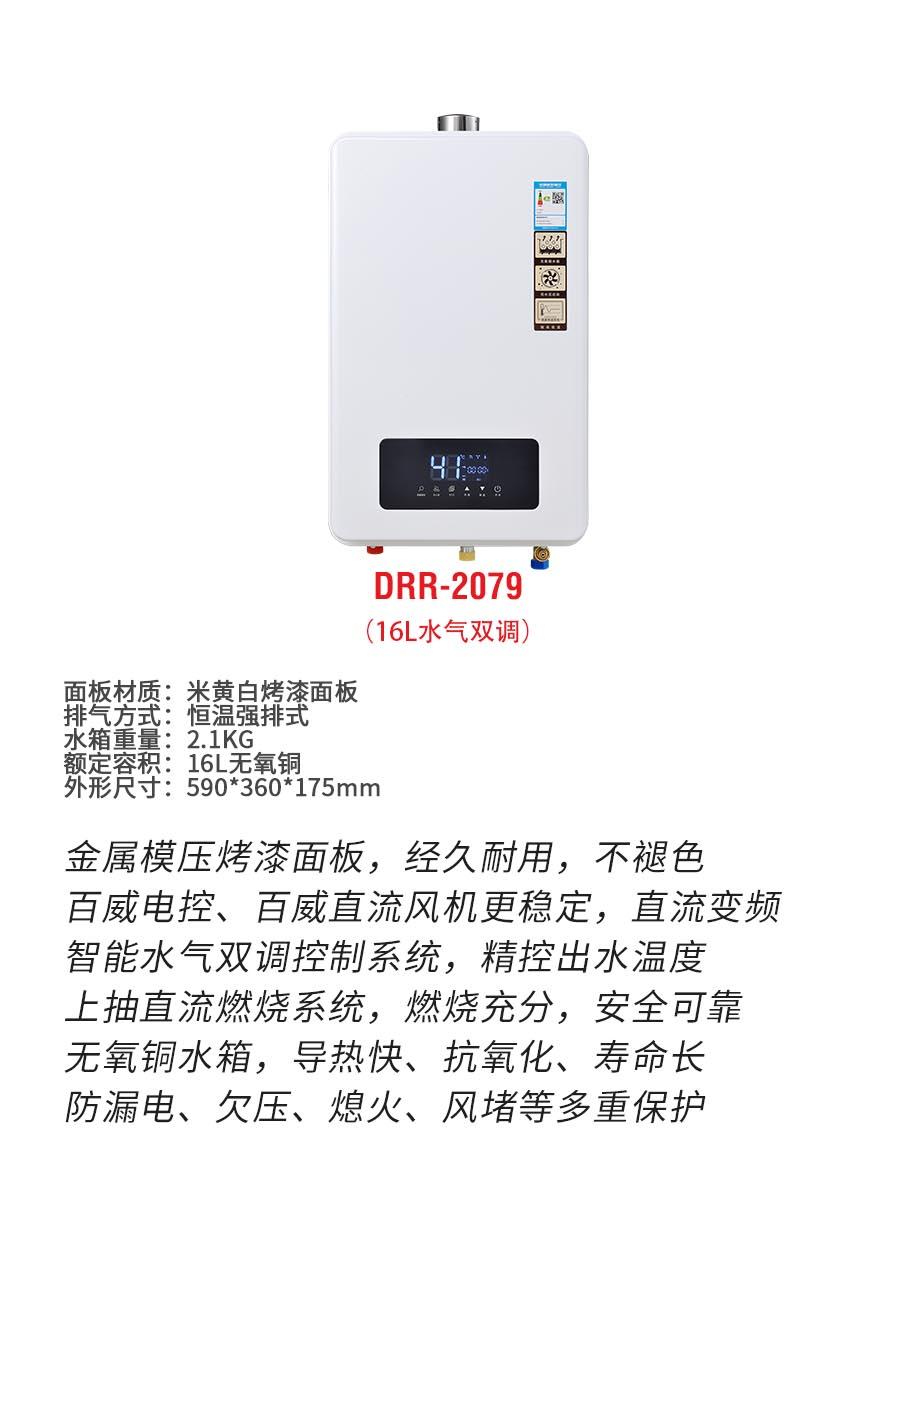 DRR-2079b.jpg